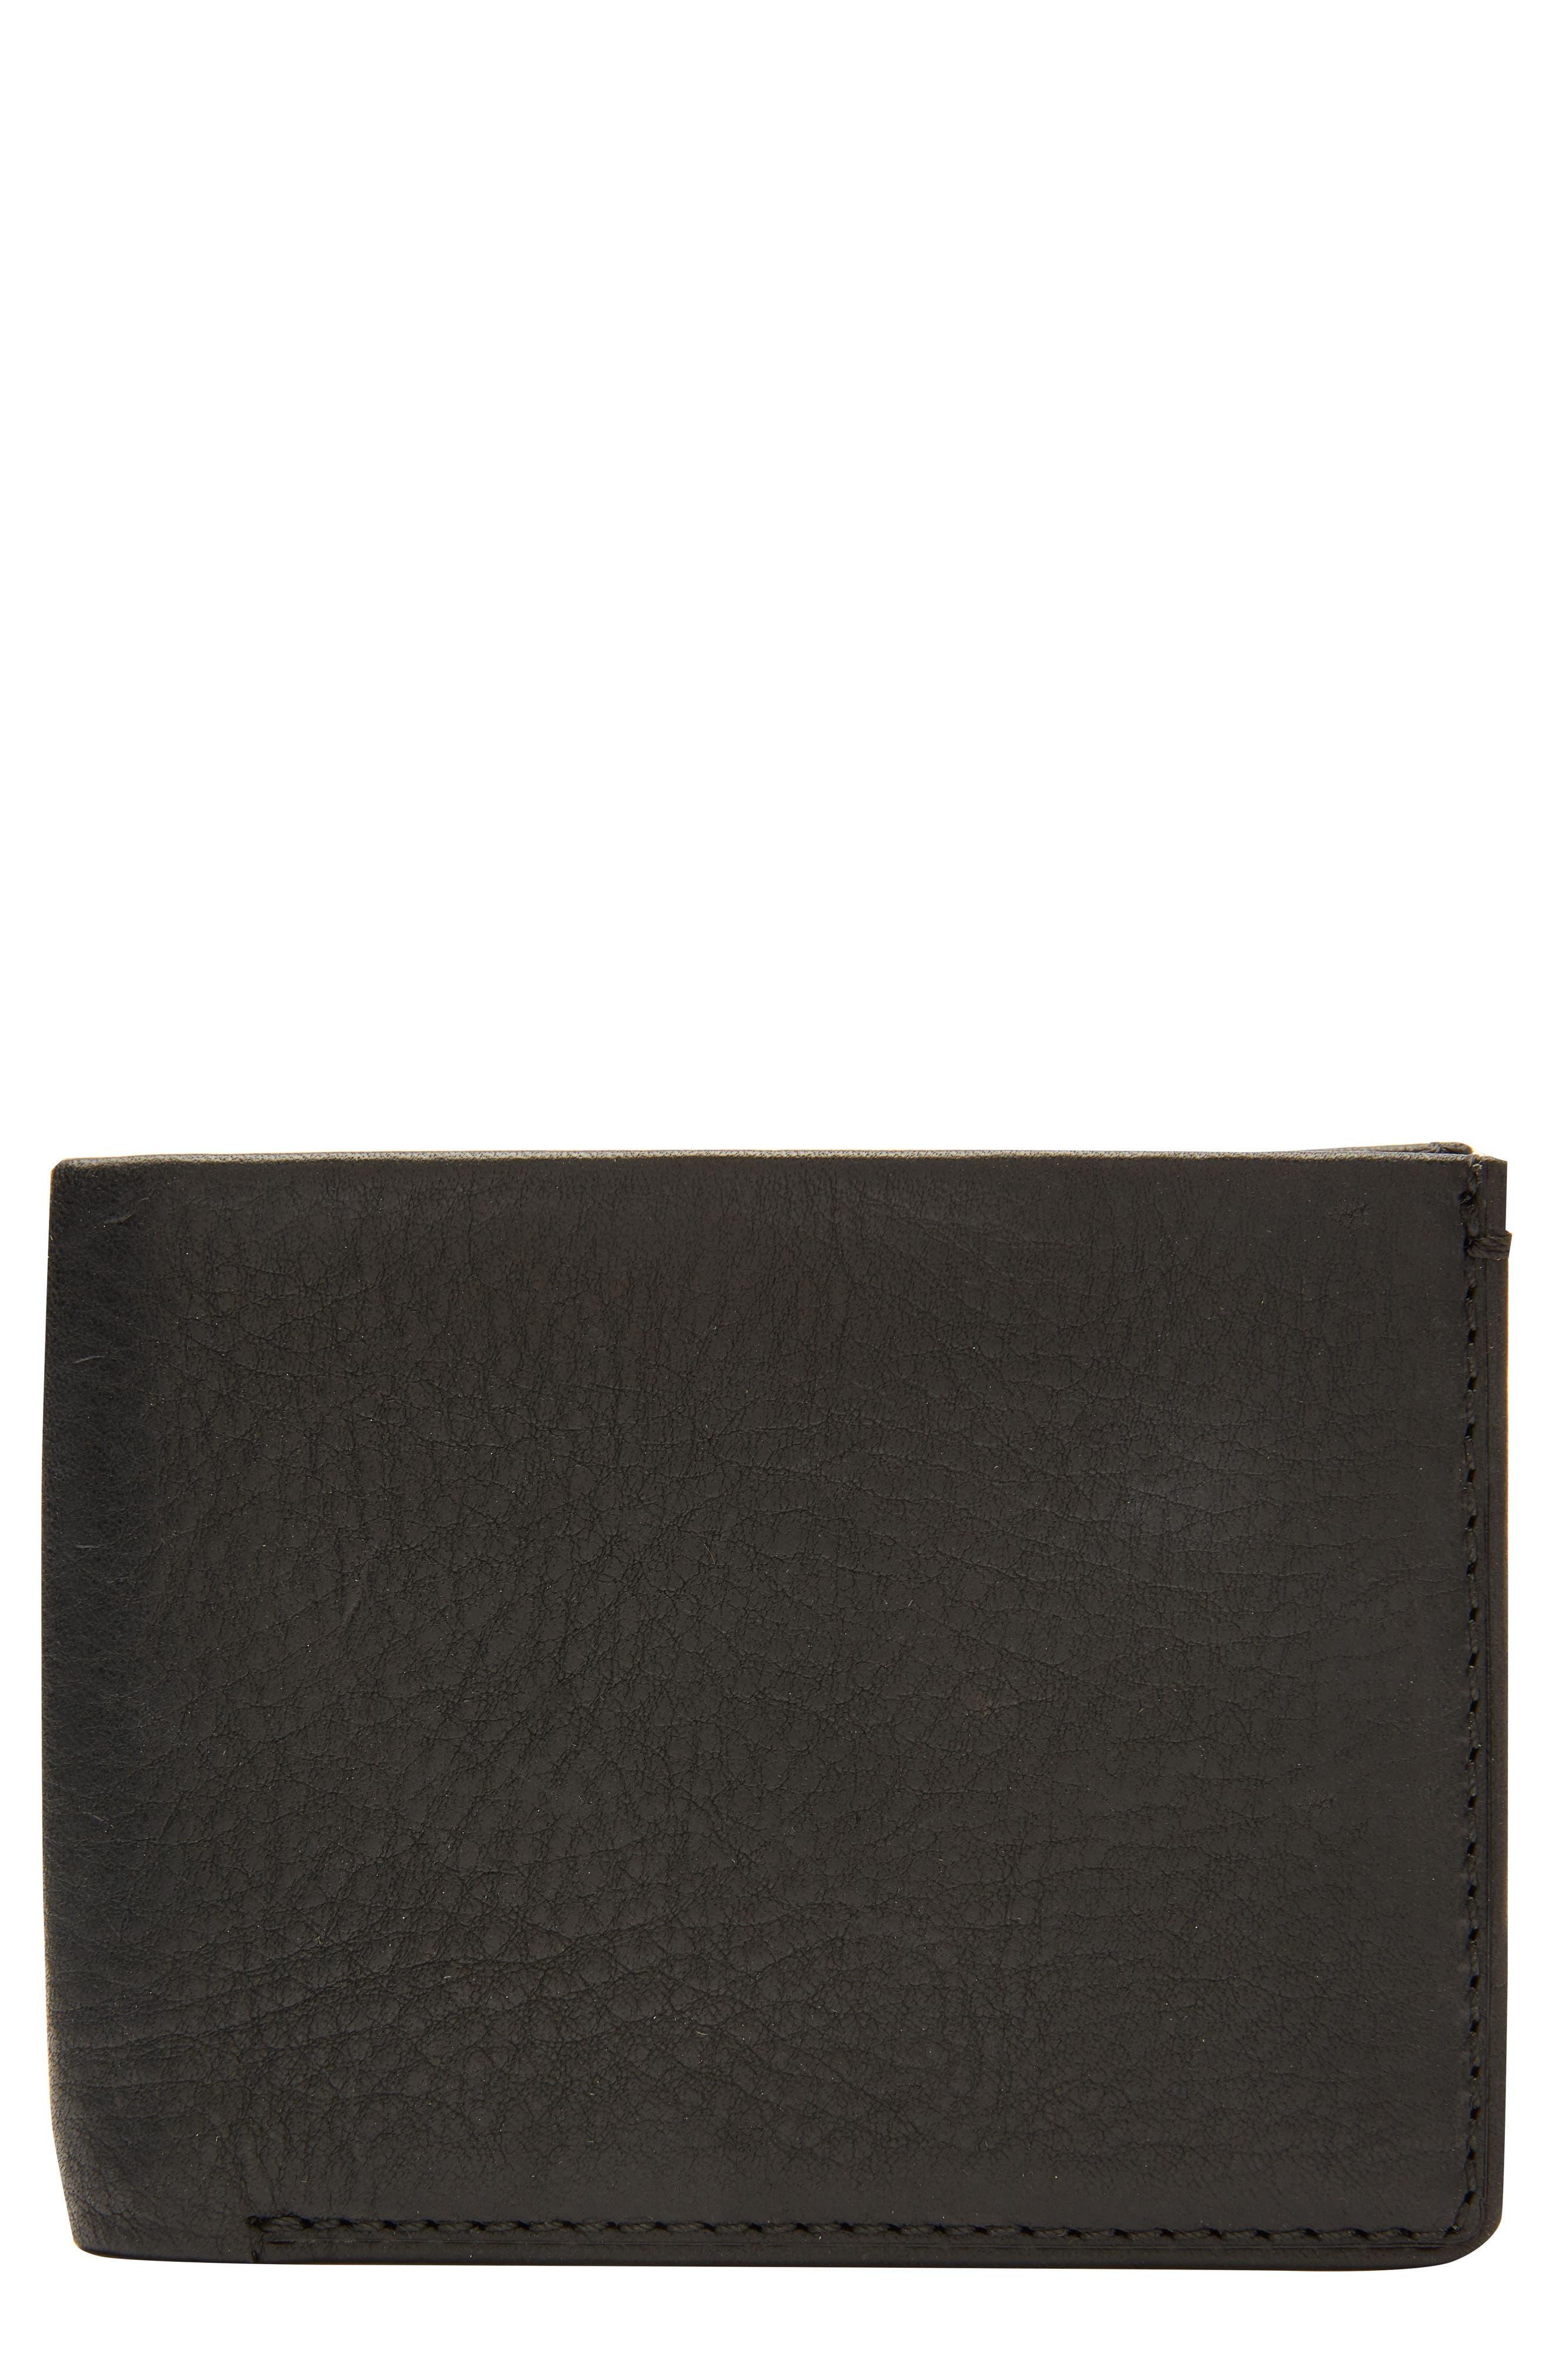 Selvedge Denim Wallet,                             Main thumbnail 1, color,                             001